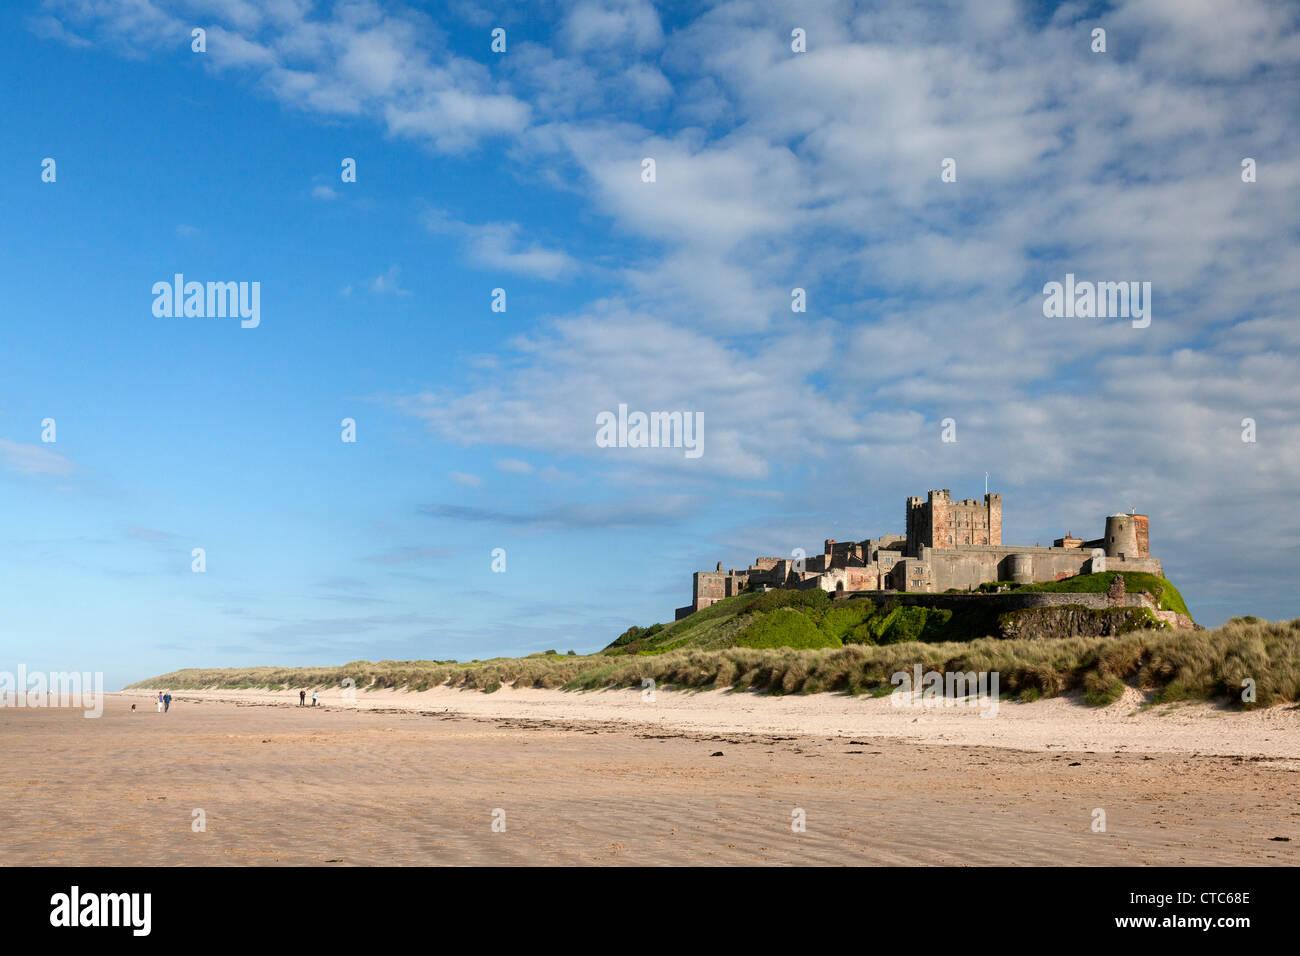 bamburgh-castle-seen-from-the-beach-northumberland-CTC68E.jpg